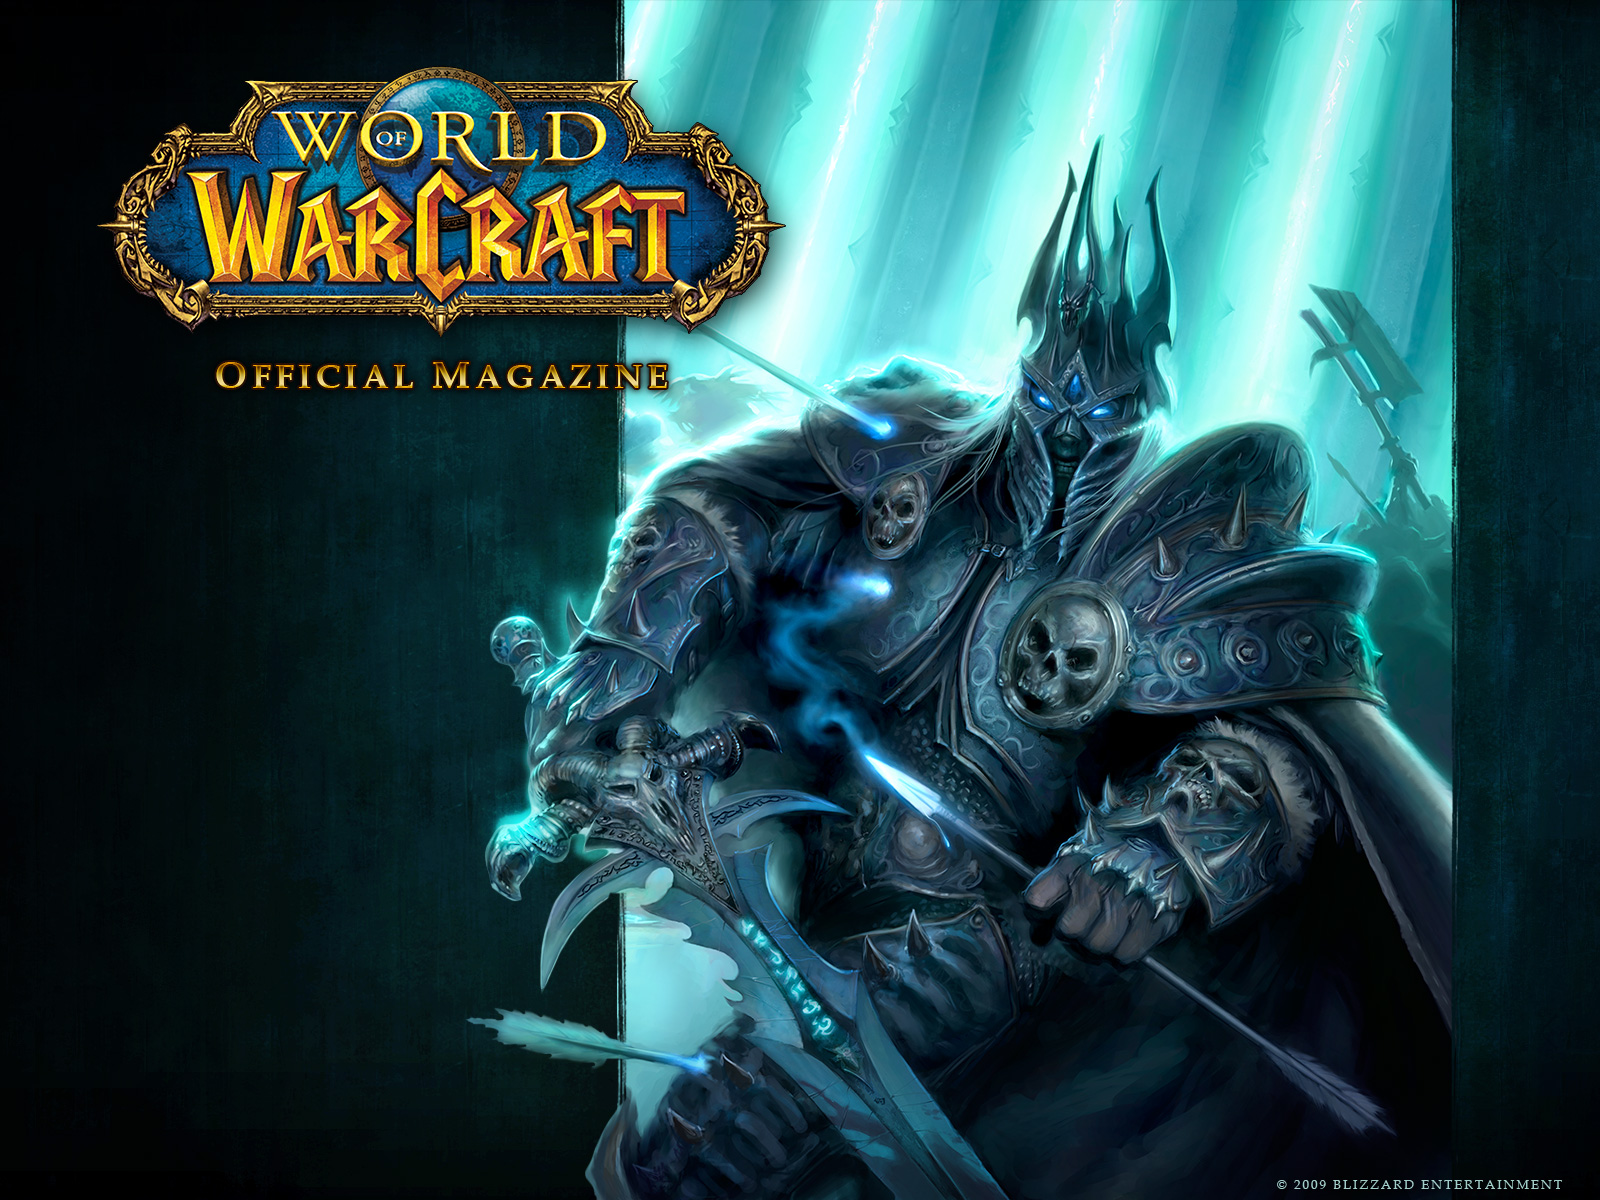 tiffany best world of warcraft wallpaper hd